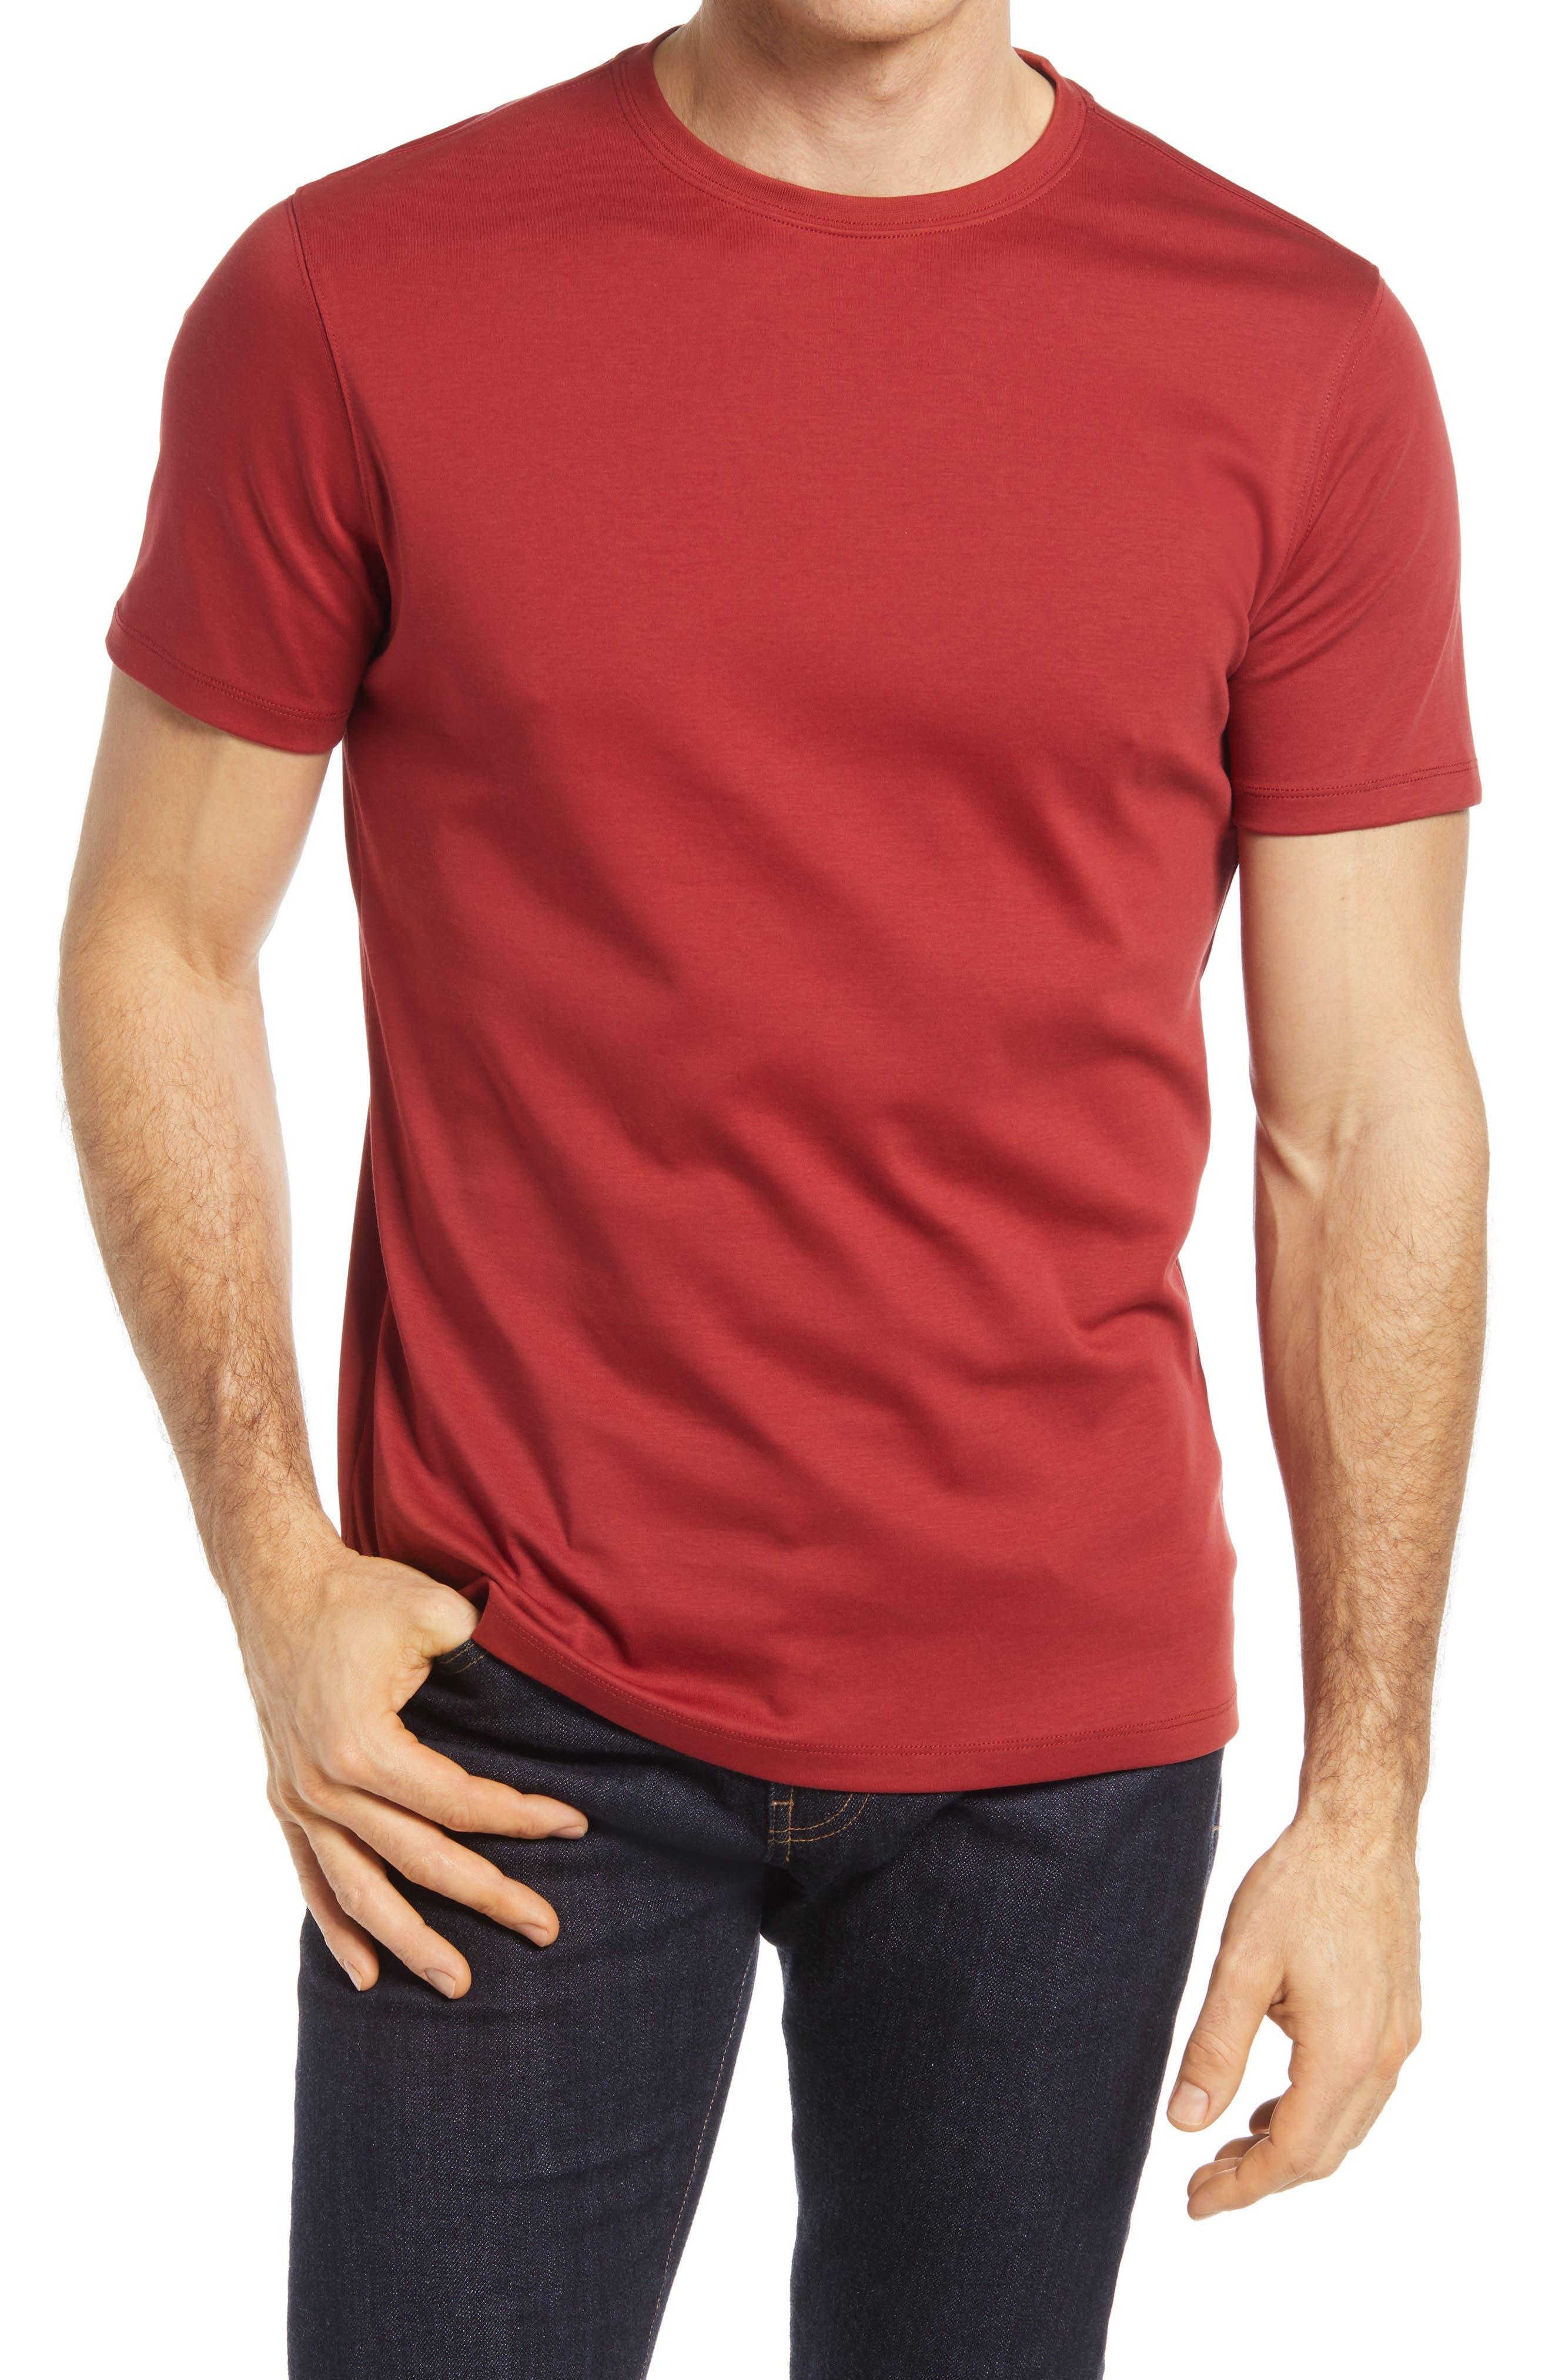 T-Shirts for Men Polo Short Sleeve T-Shirts Top Men Tees L